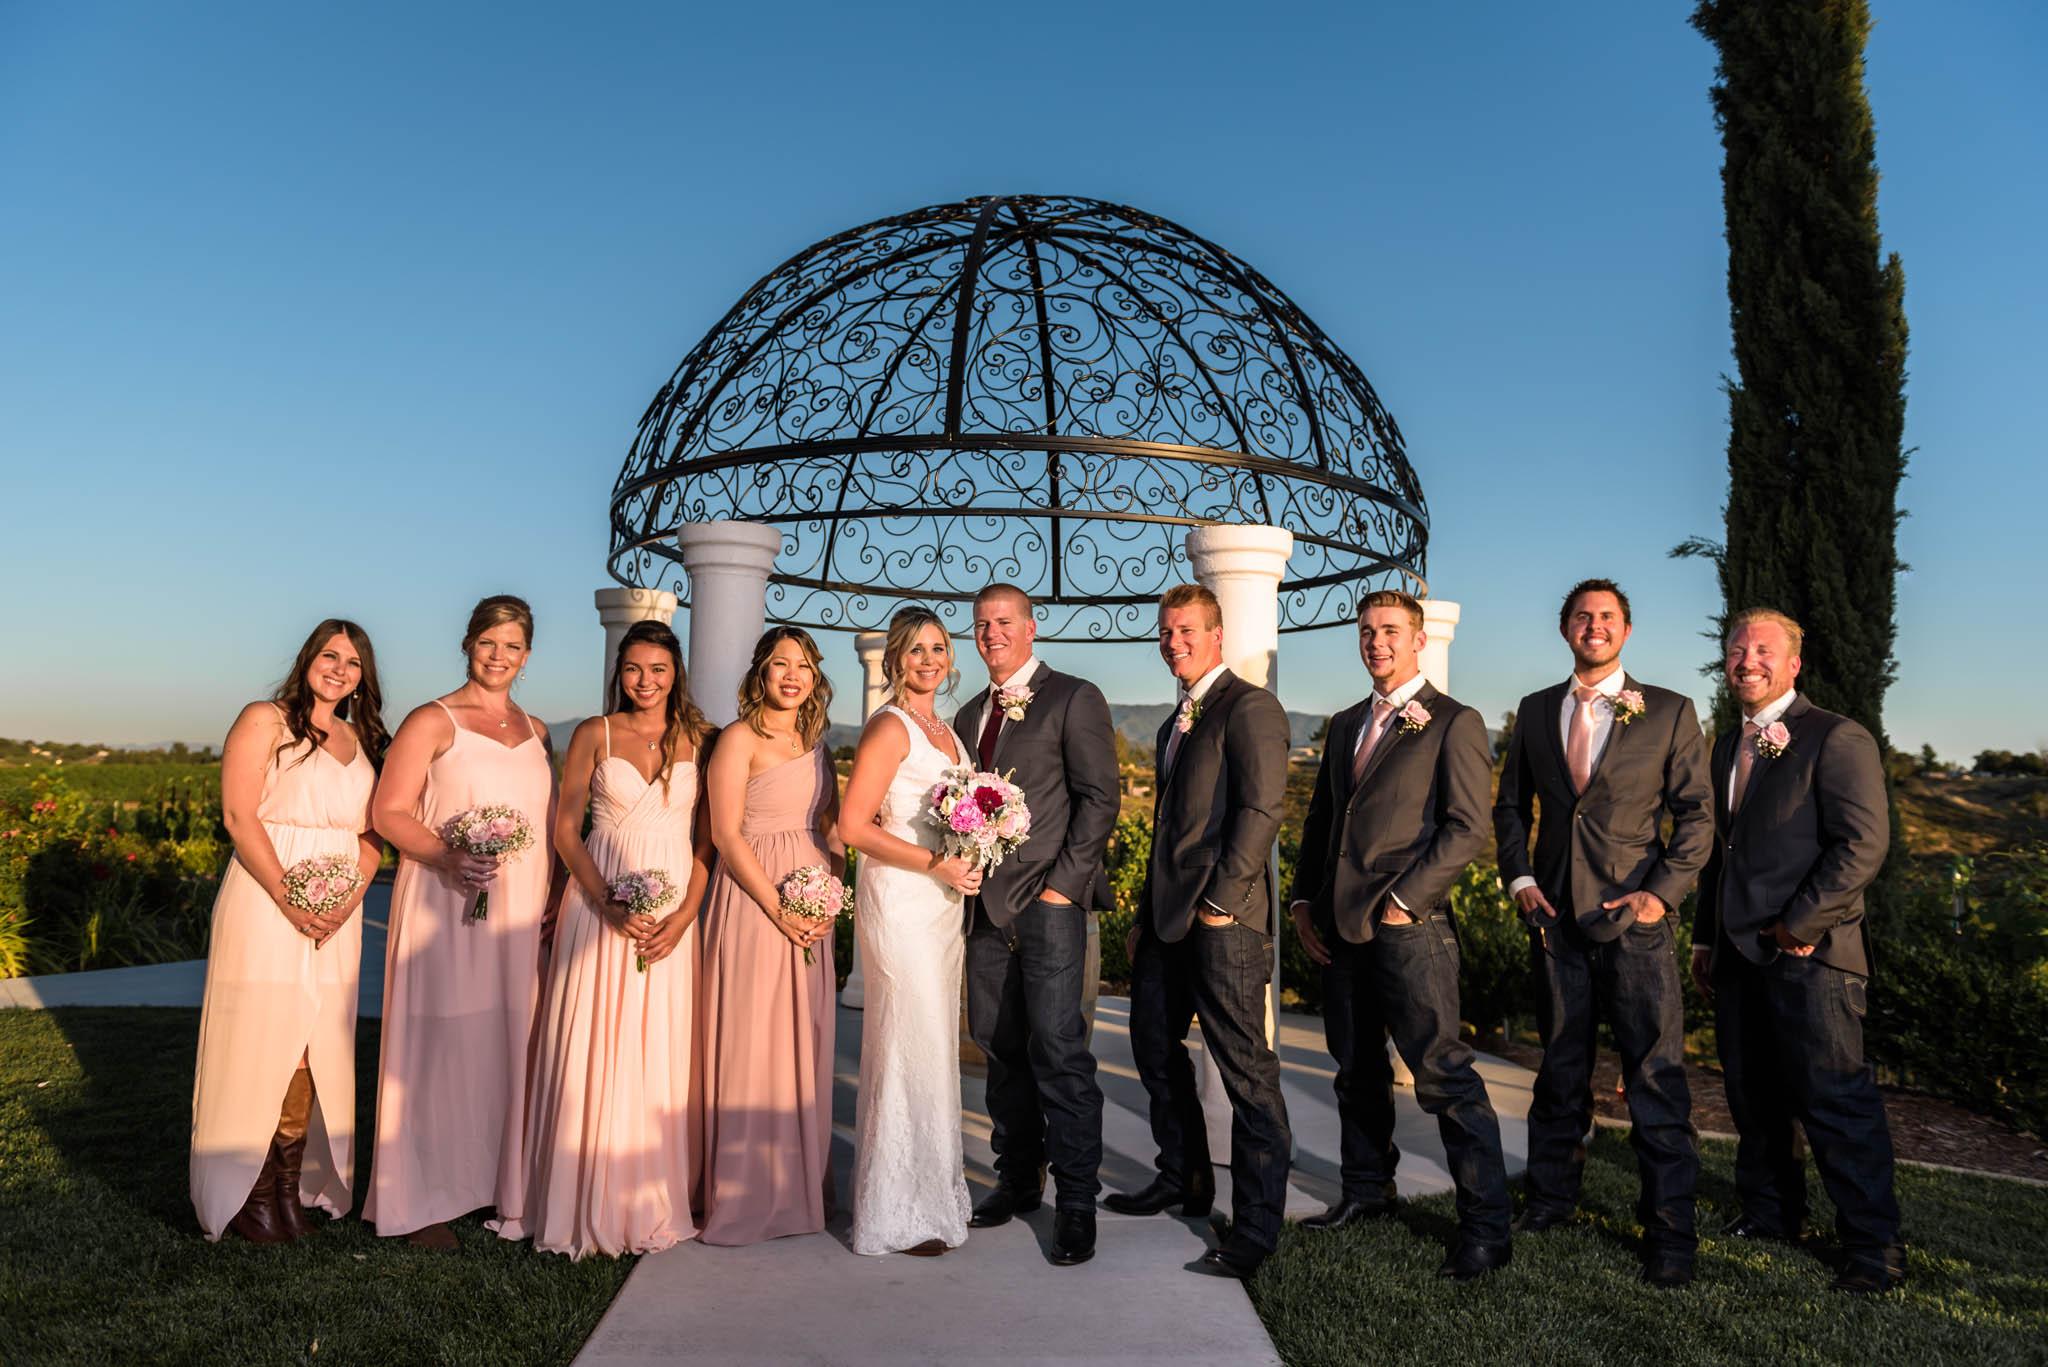 Avensole-Winery-Temecula-Wedding-Josh-and-Olivia-3736.JPG